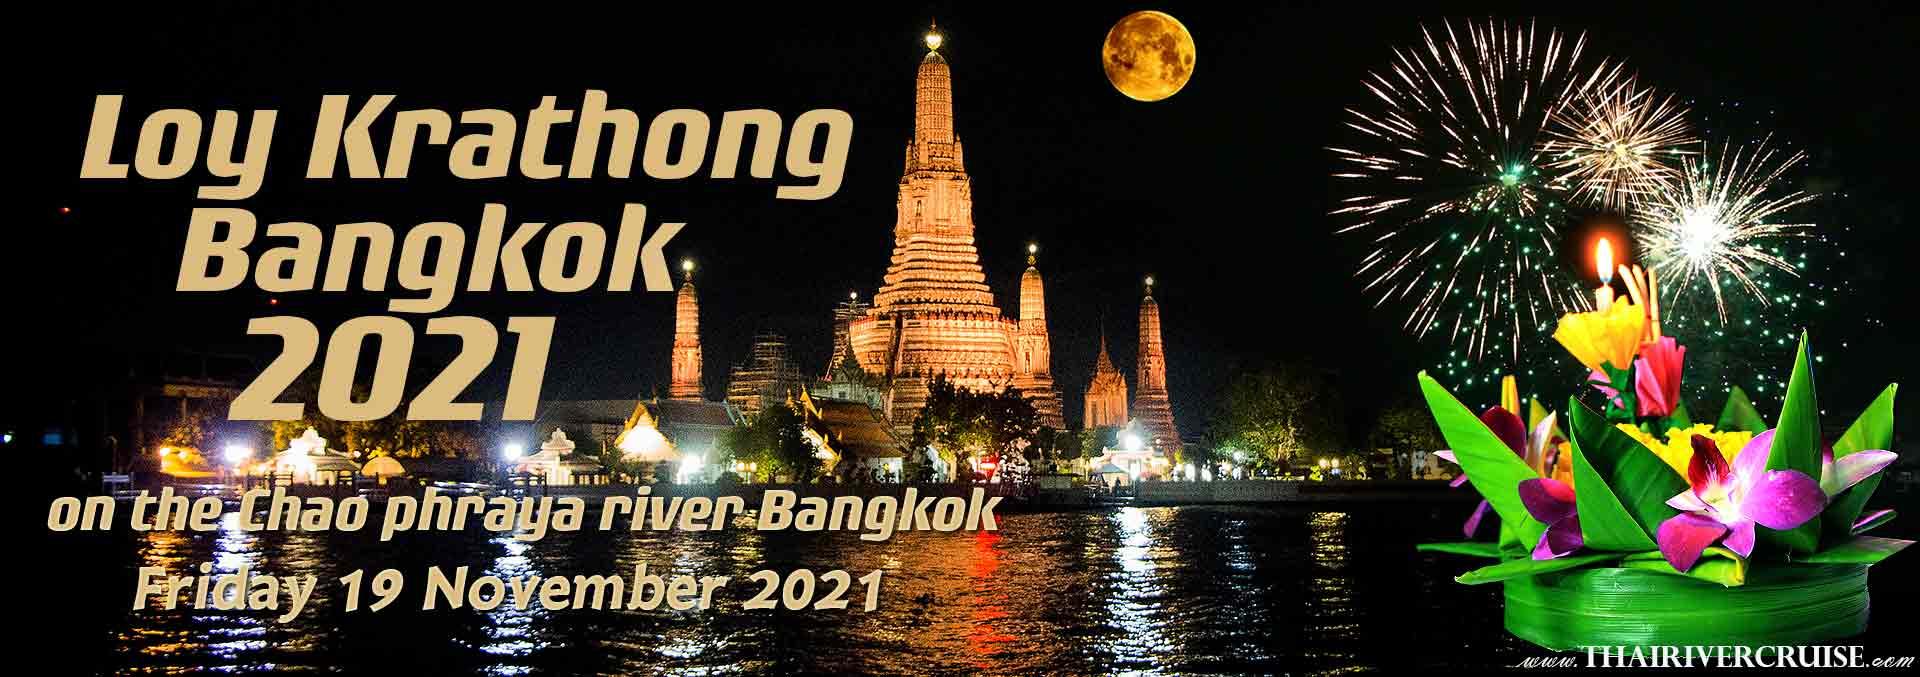 Loy Krathong 2021 Bangkok Dinner Cruise on the Chaophraya river Bangkok Thailand